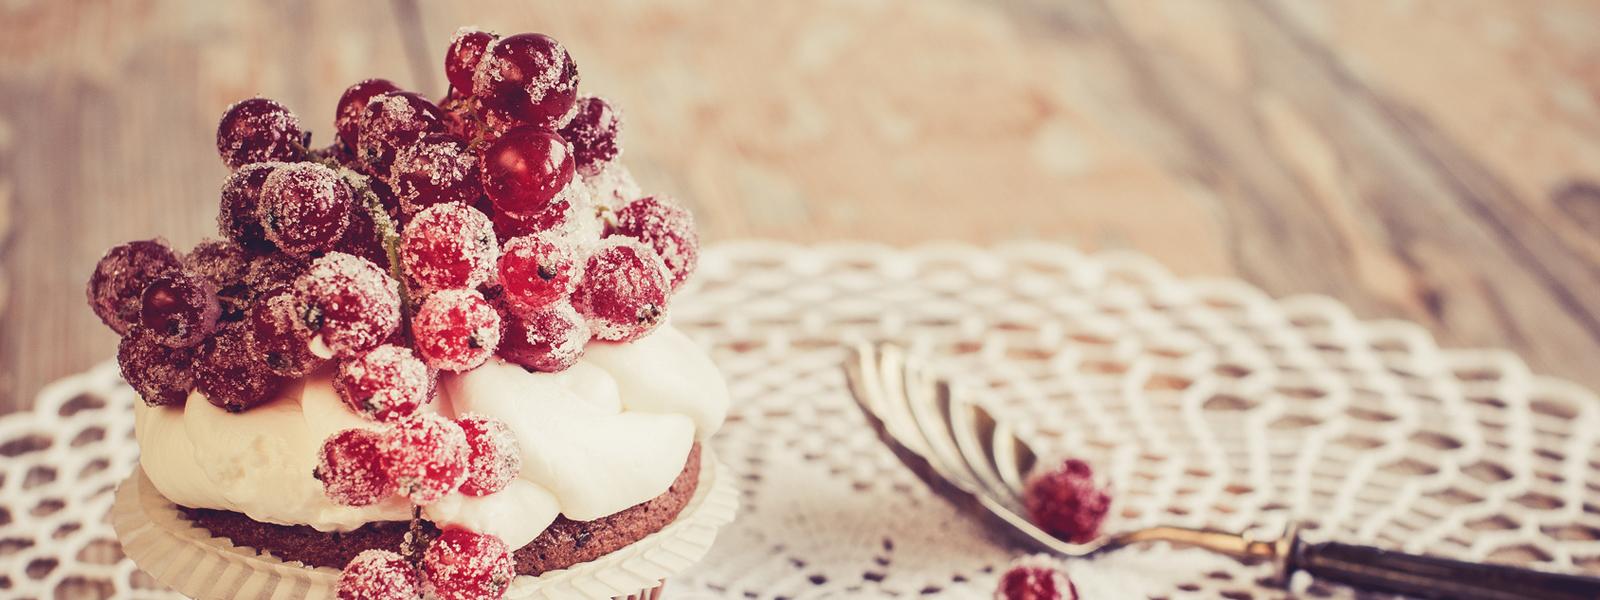 Cupcake mit Johannisbeere